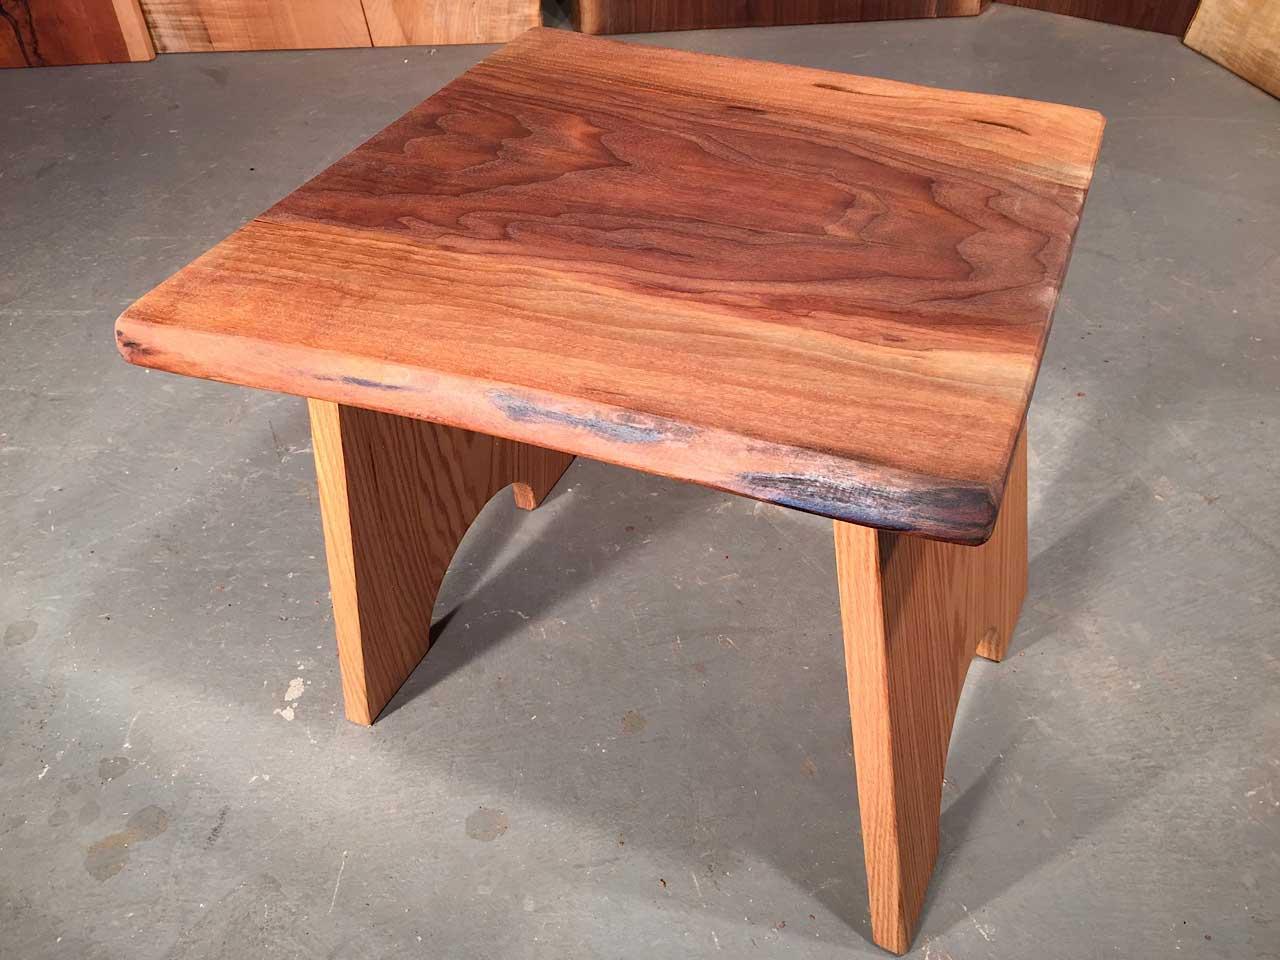 Walnut Live Edge Slab Top With Solid Oak Legs